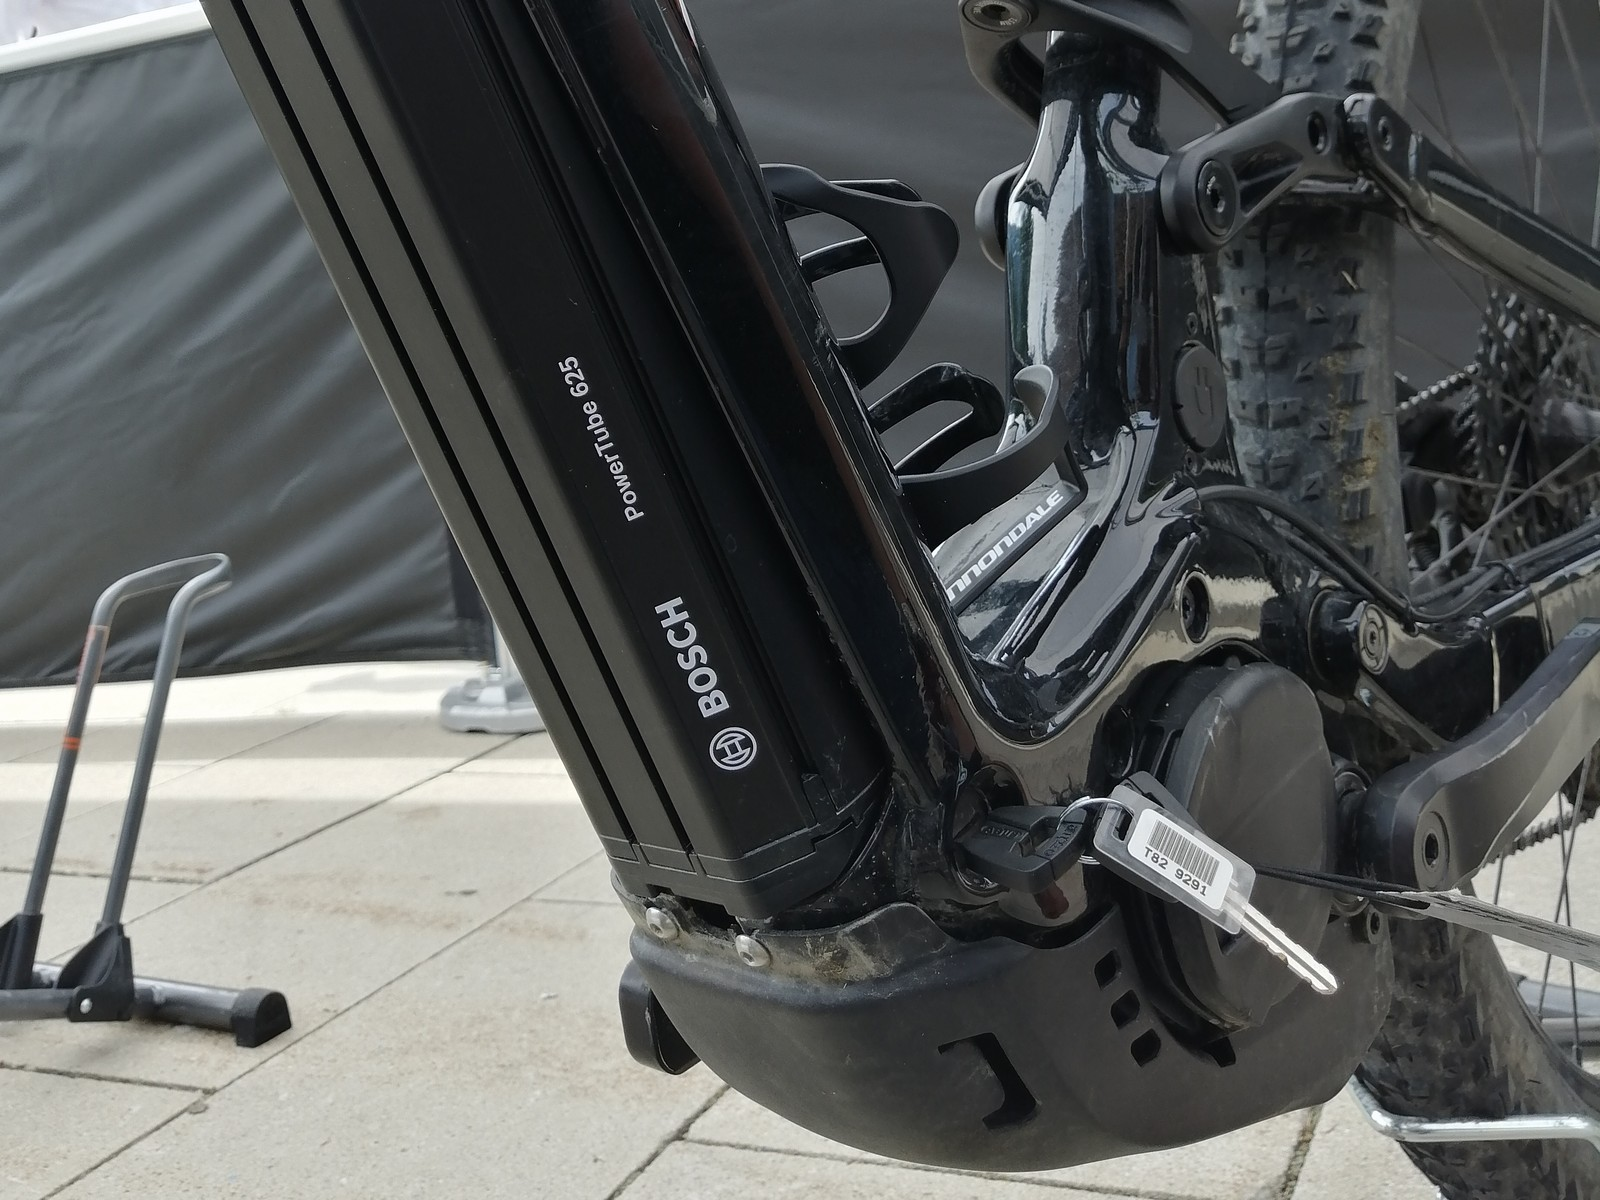 Bosch PowerTube 625 Wh - Cannondale Moterra Neo